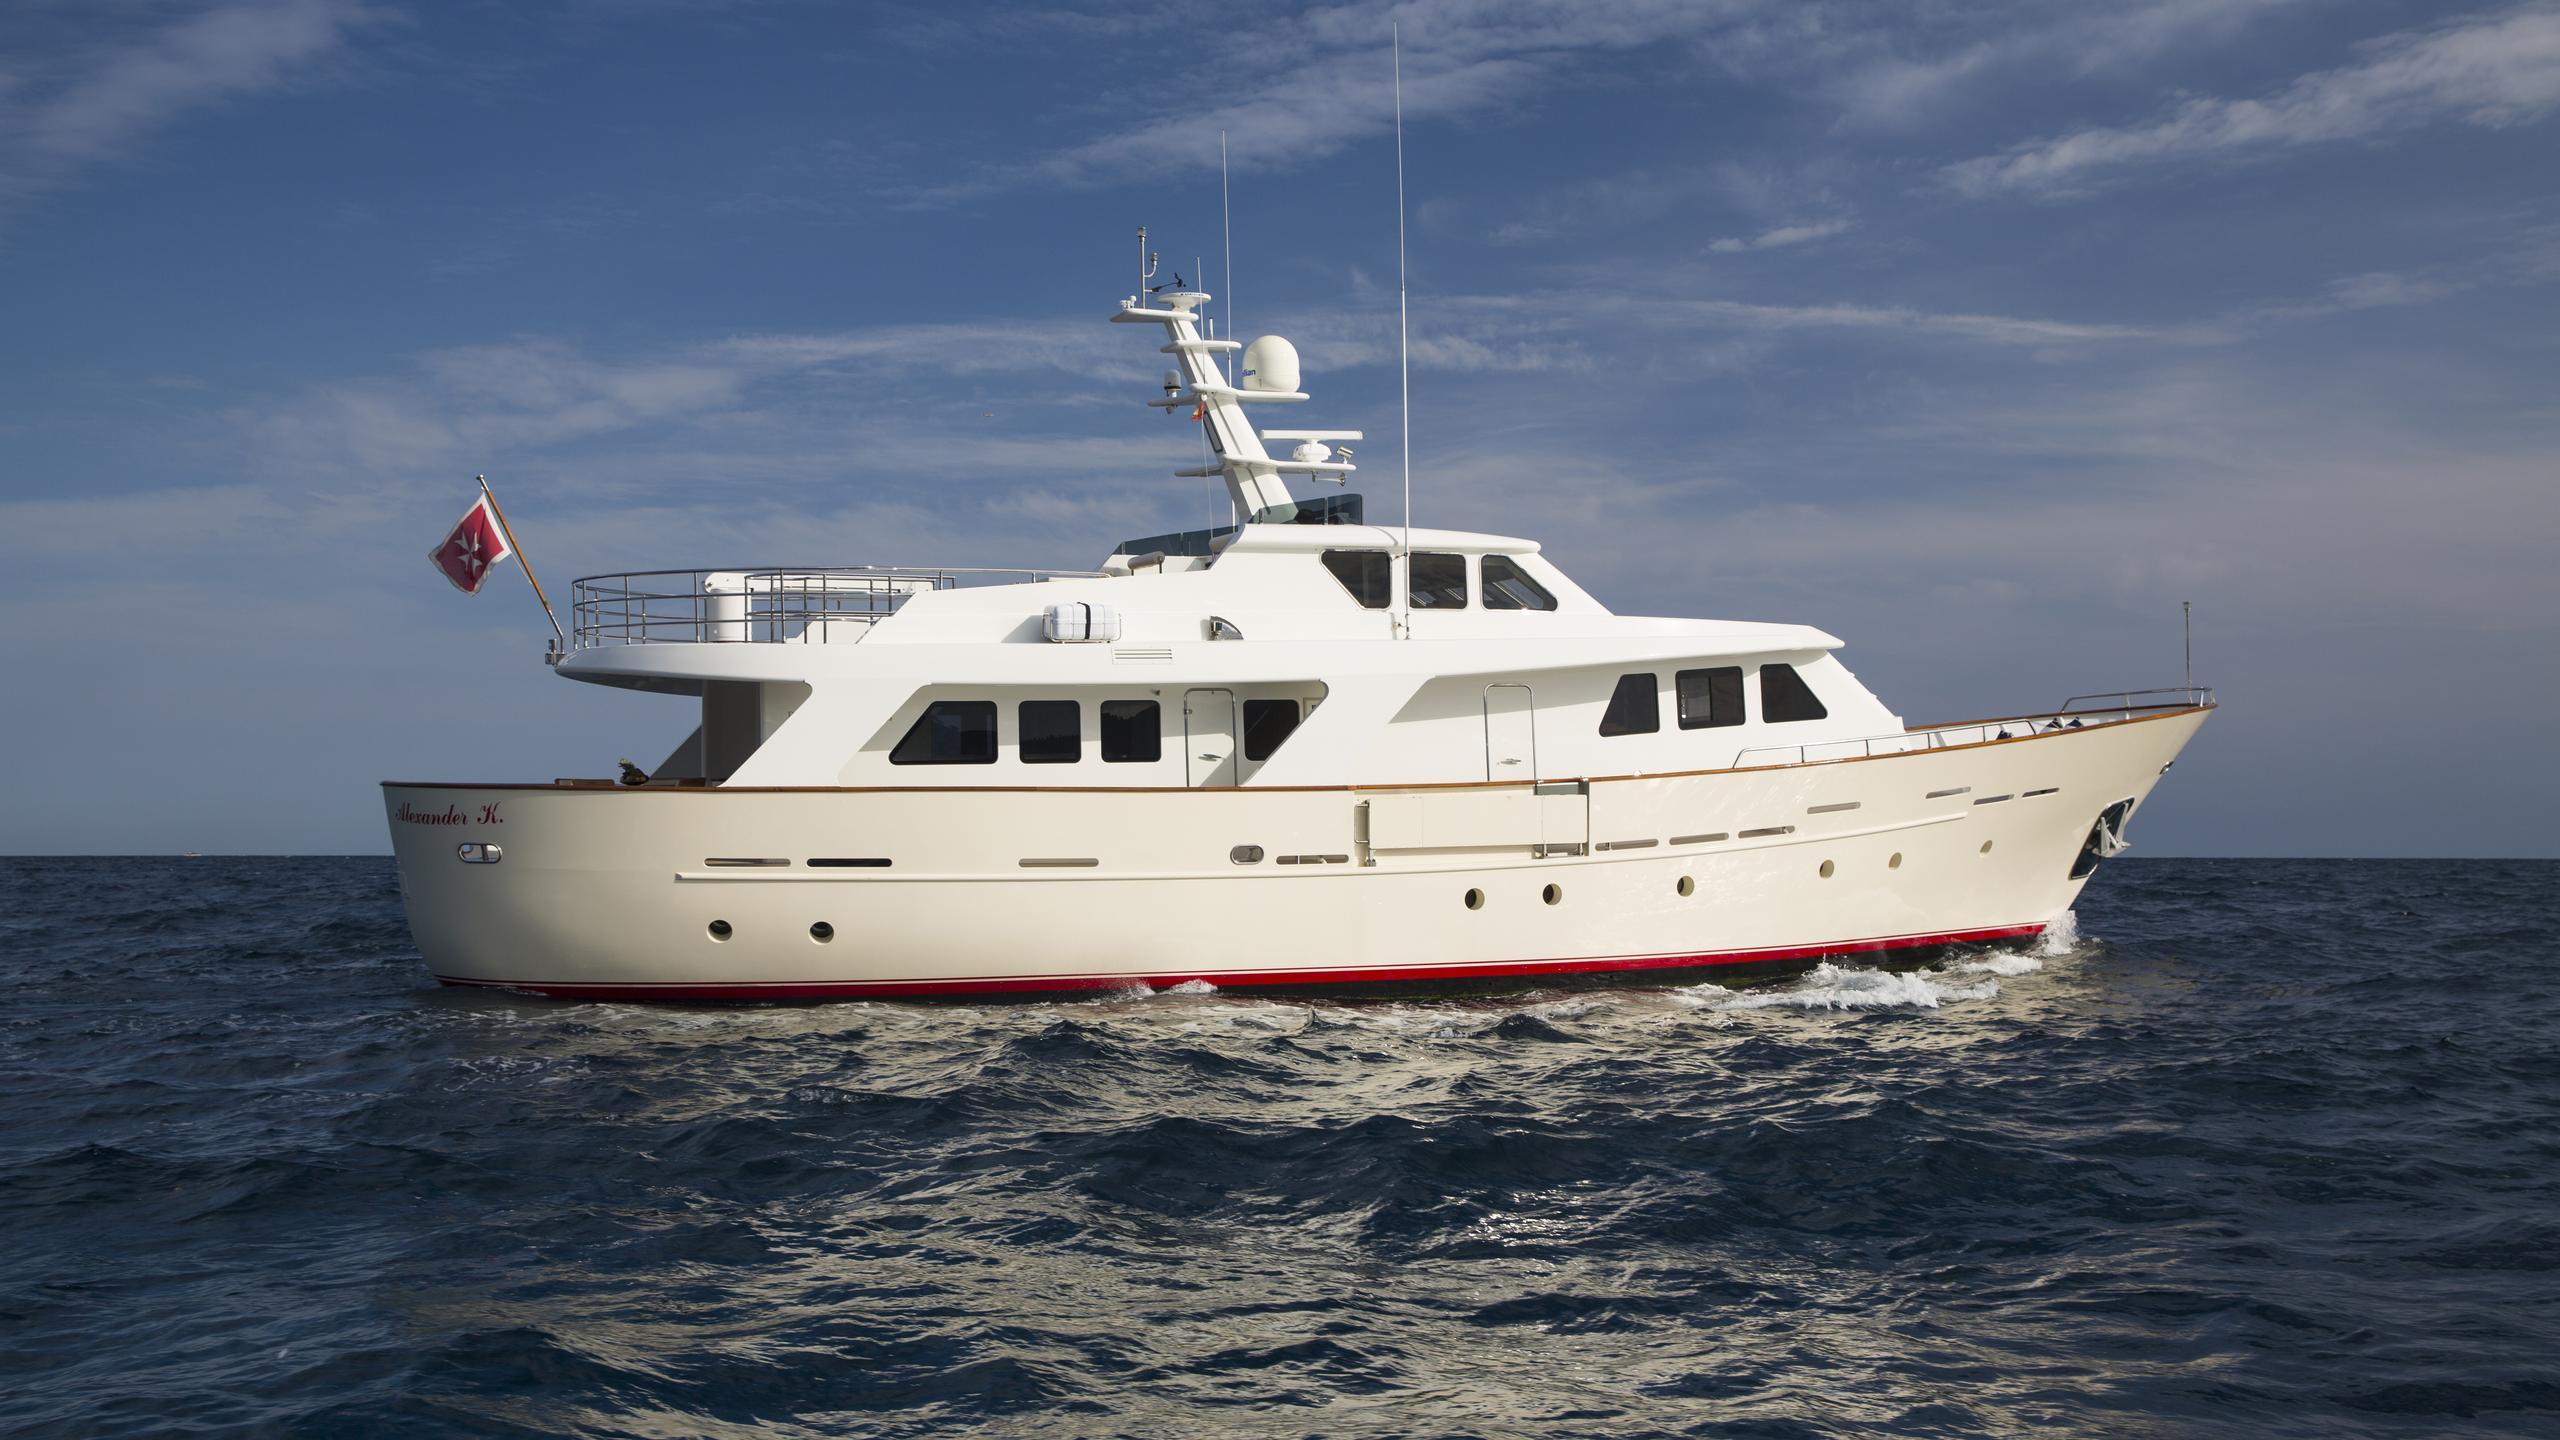 alexander-k-yacht-for-sale-profile